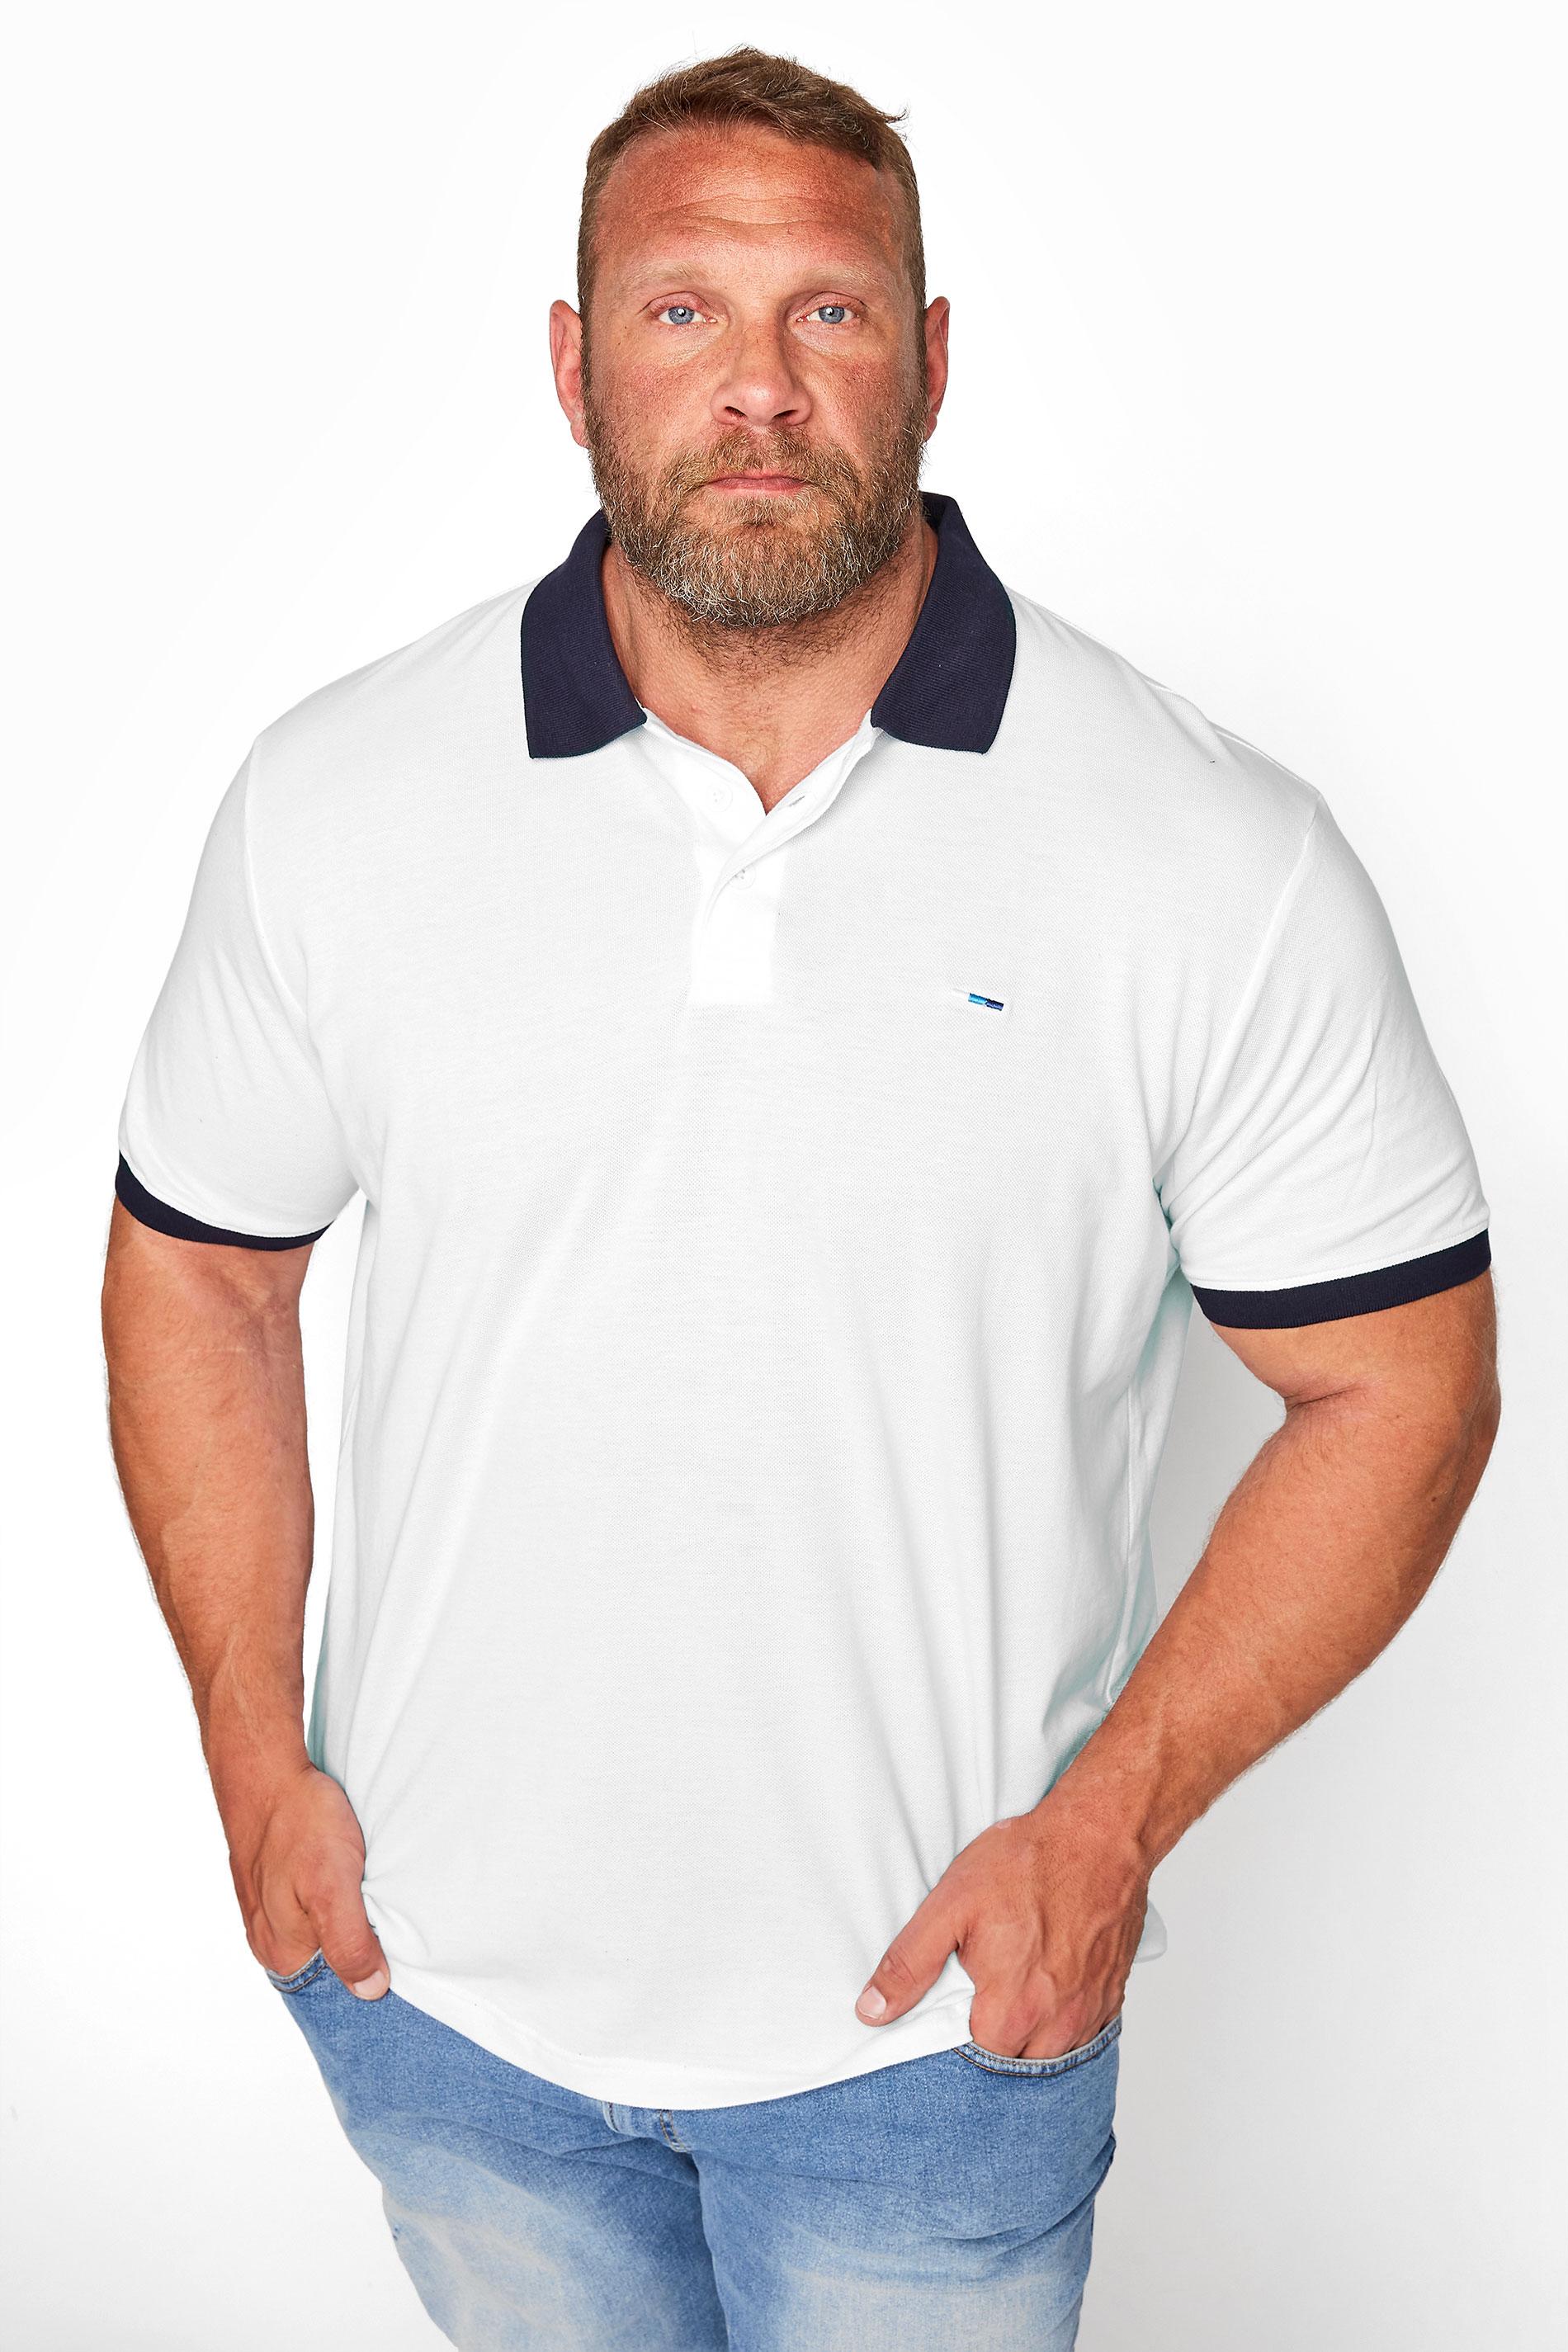 BadRhino White & Navy Contrast Polo Shirt